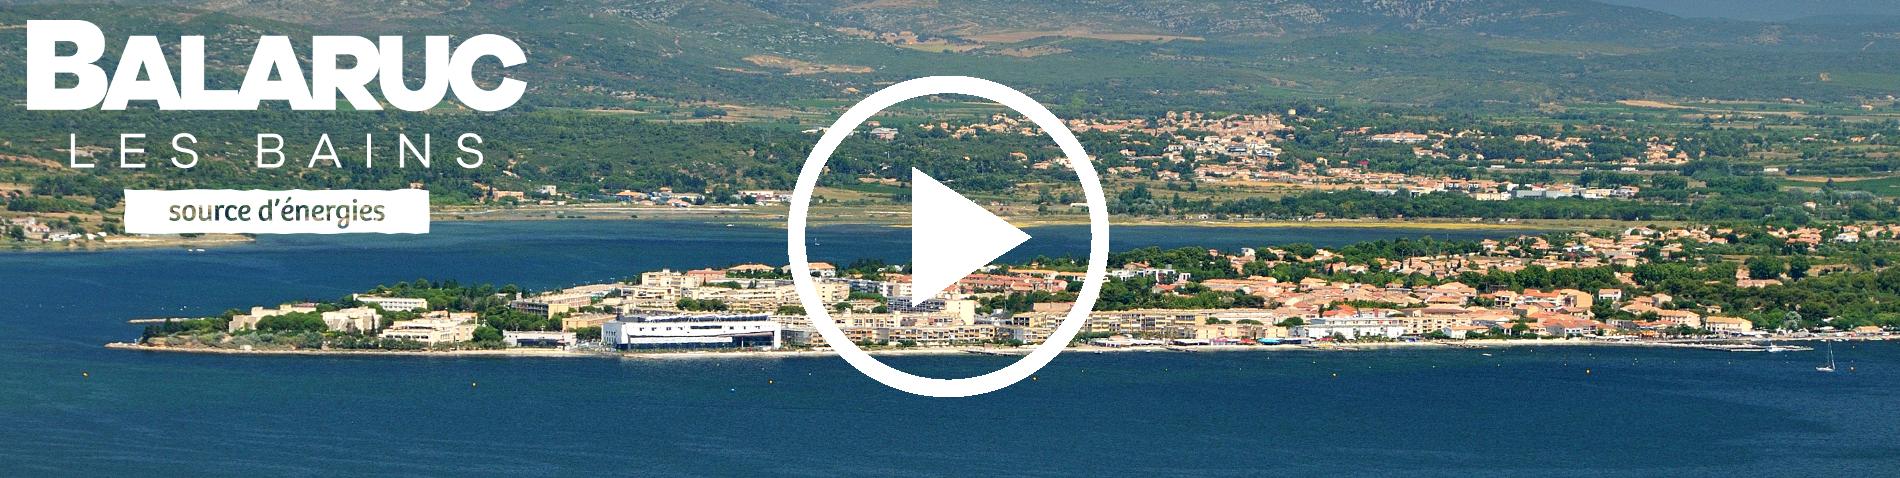 Balaruc-les-Bains en vidéo